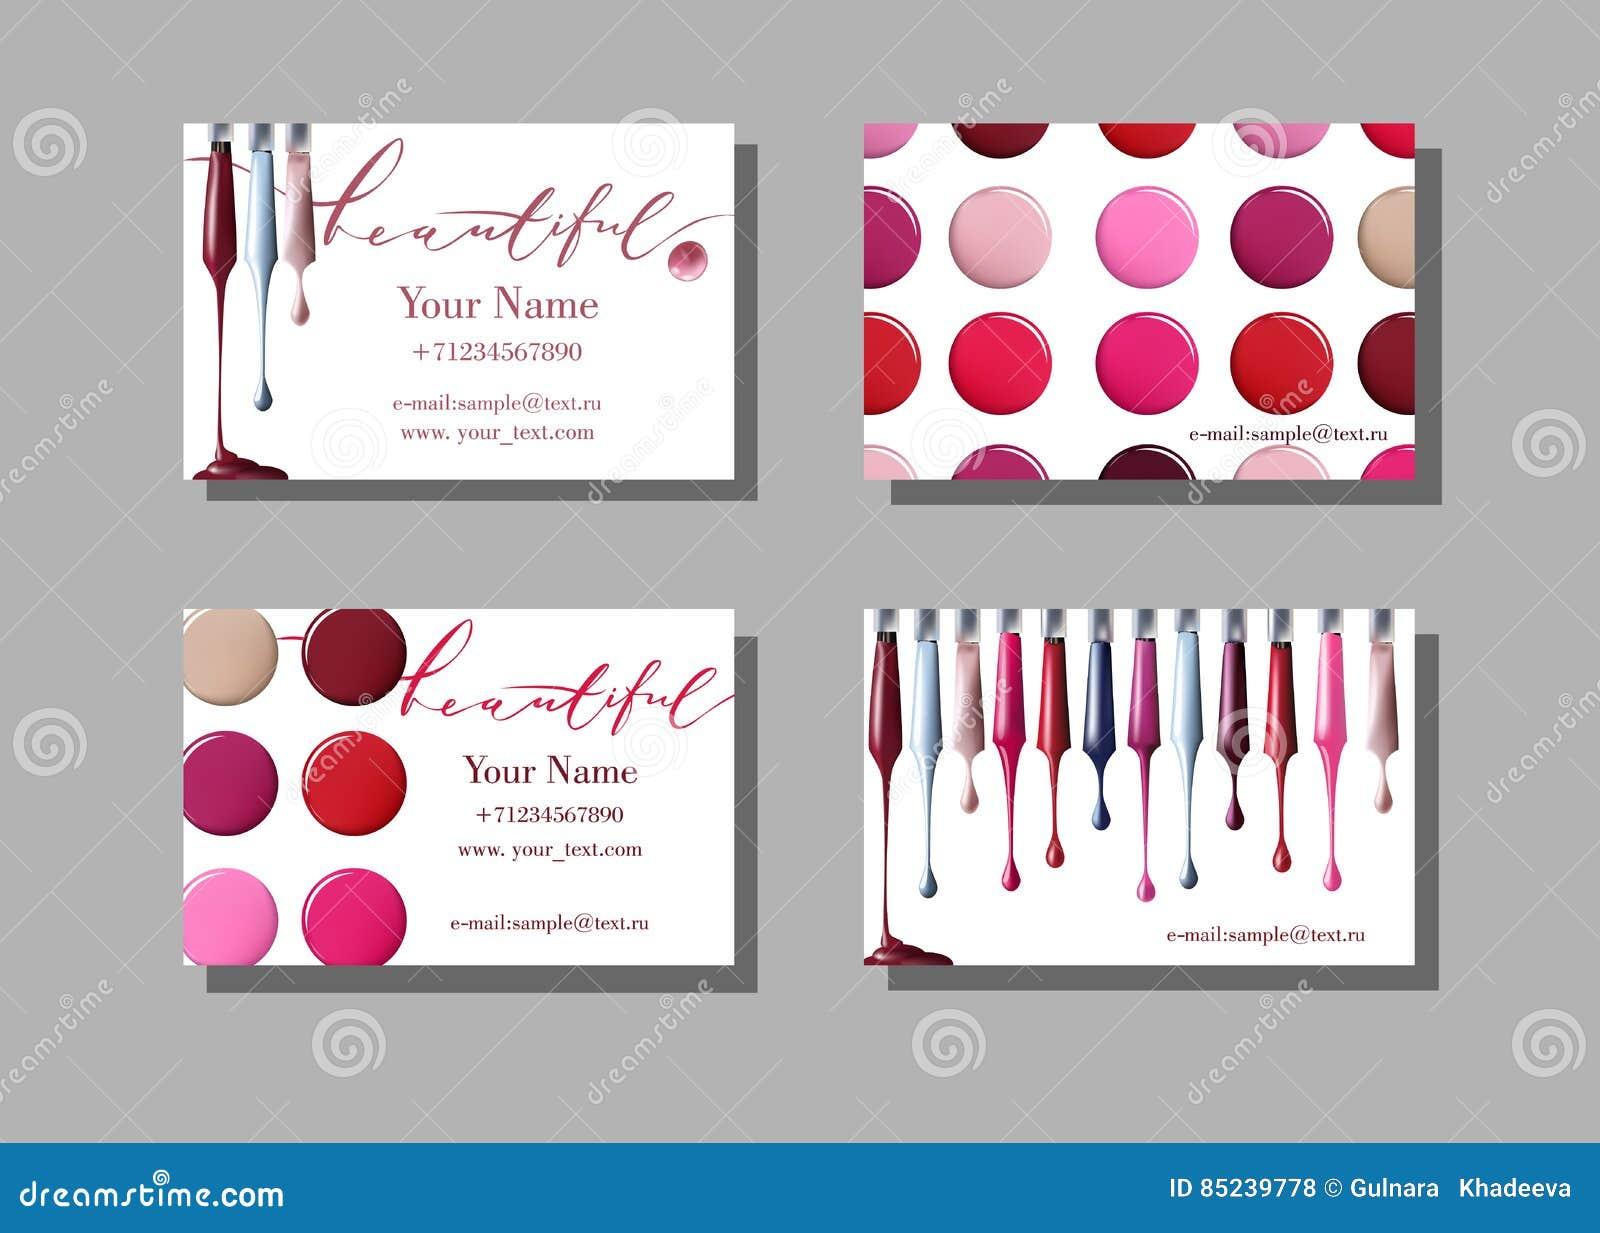 Makeup Artist Business Card. Vector Template With Makeup Items ...